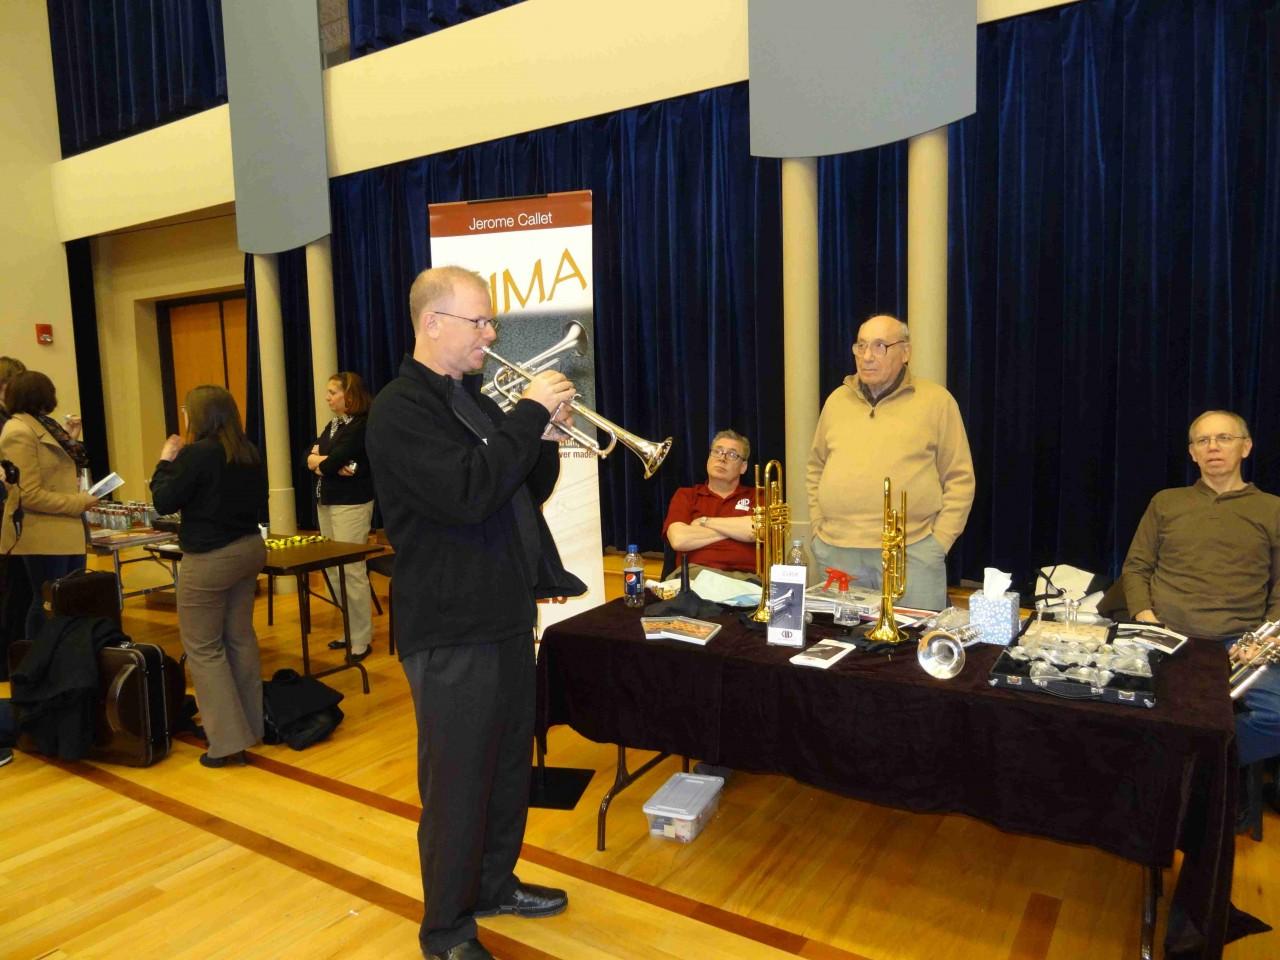 Steve Wigler auditions a trumpet